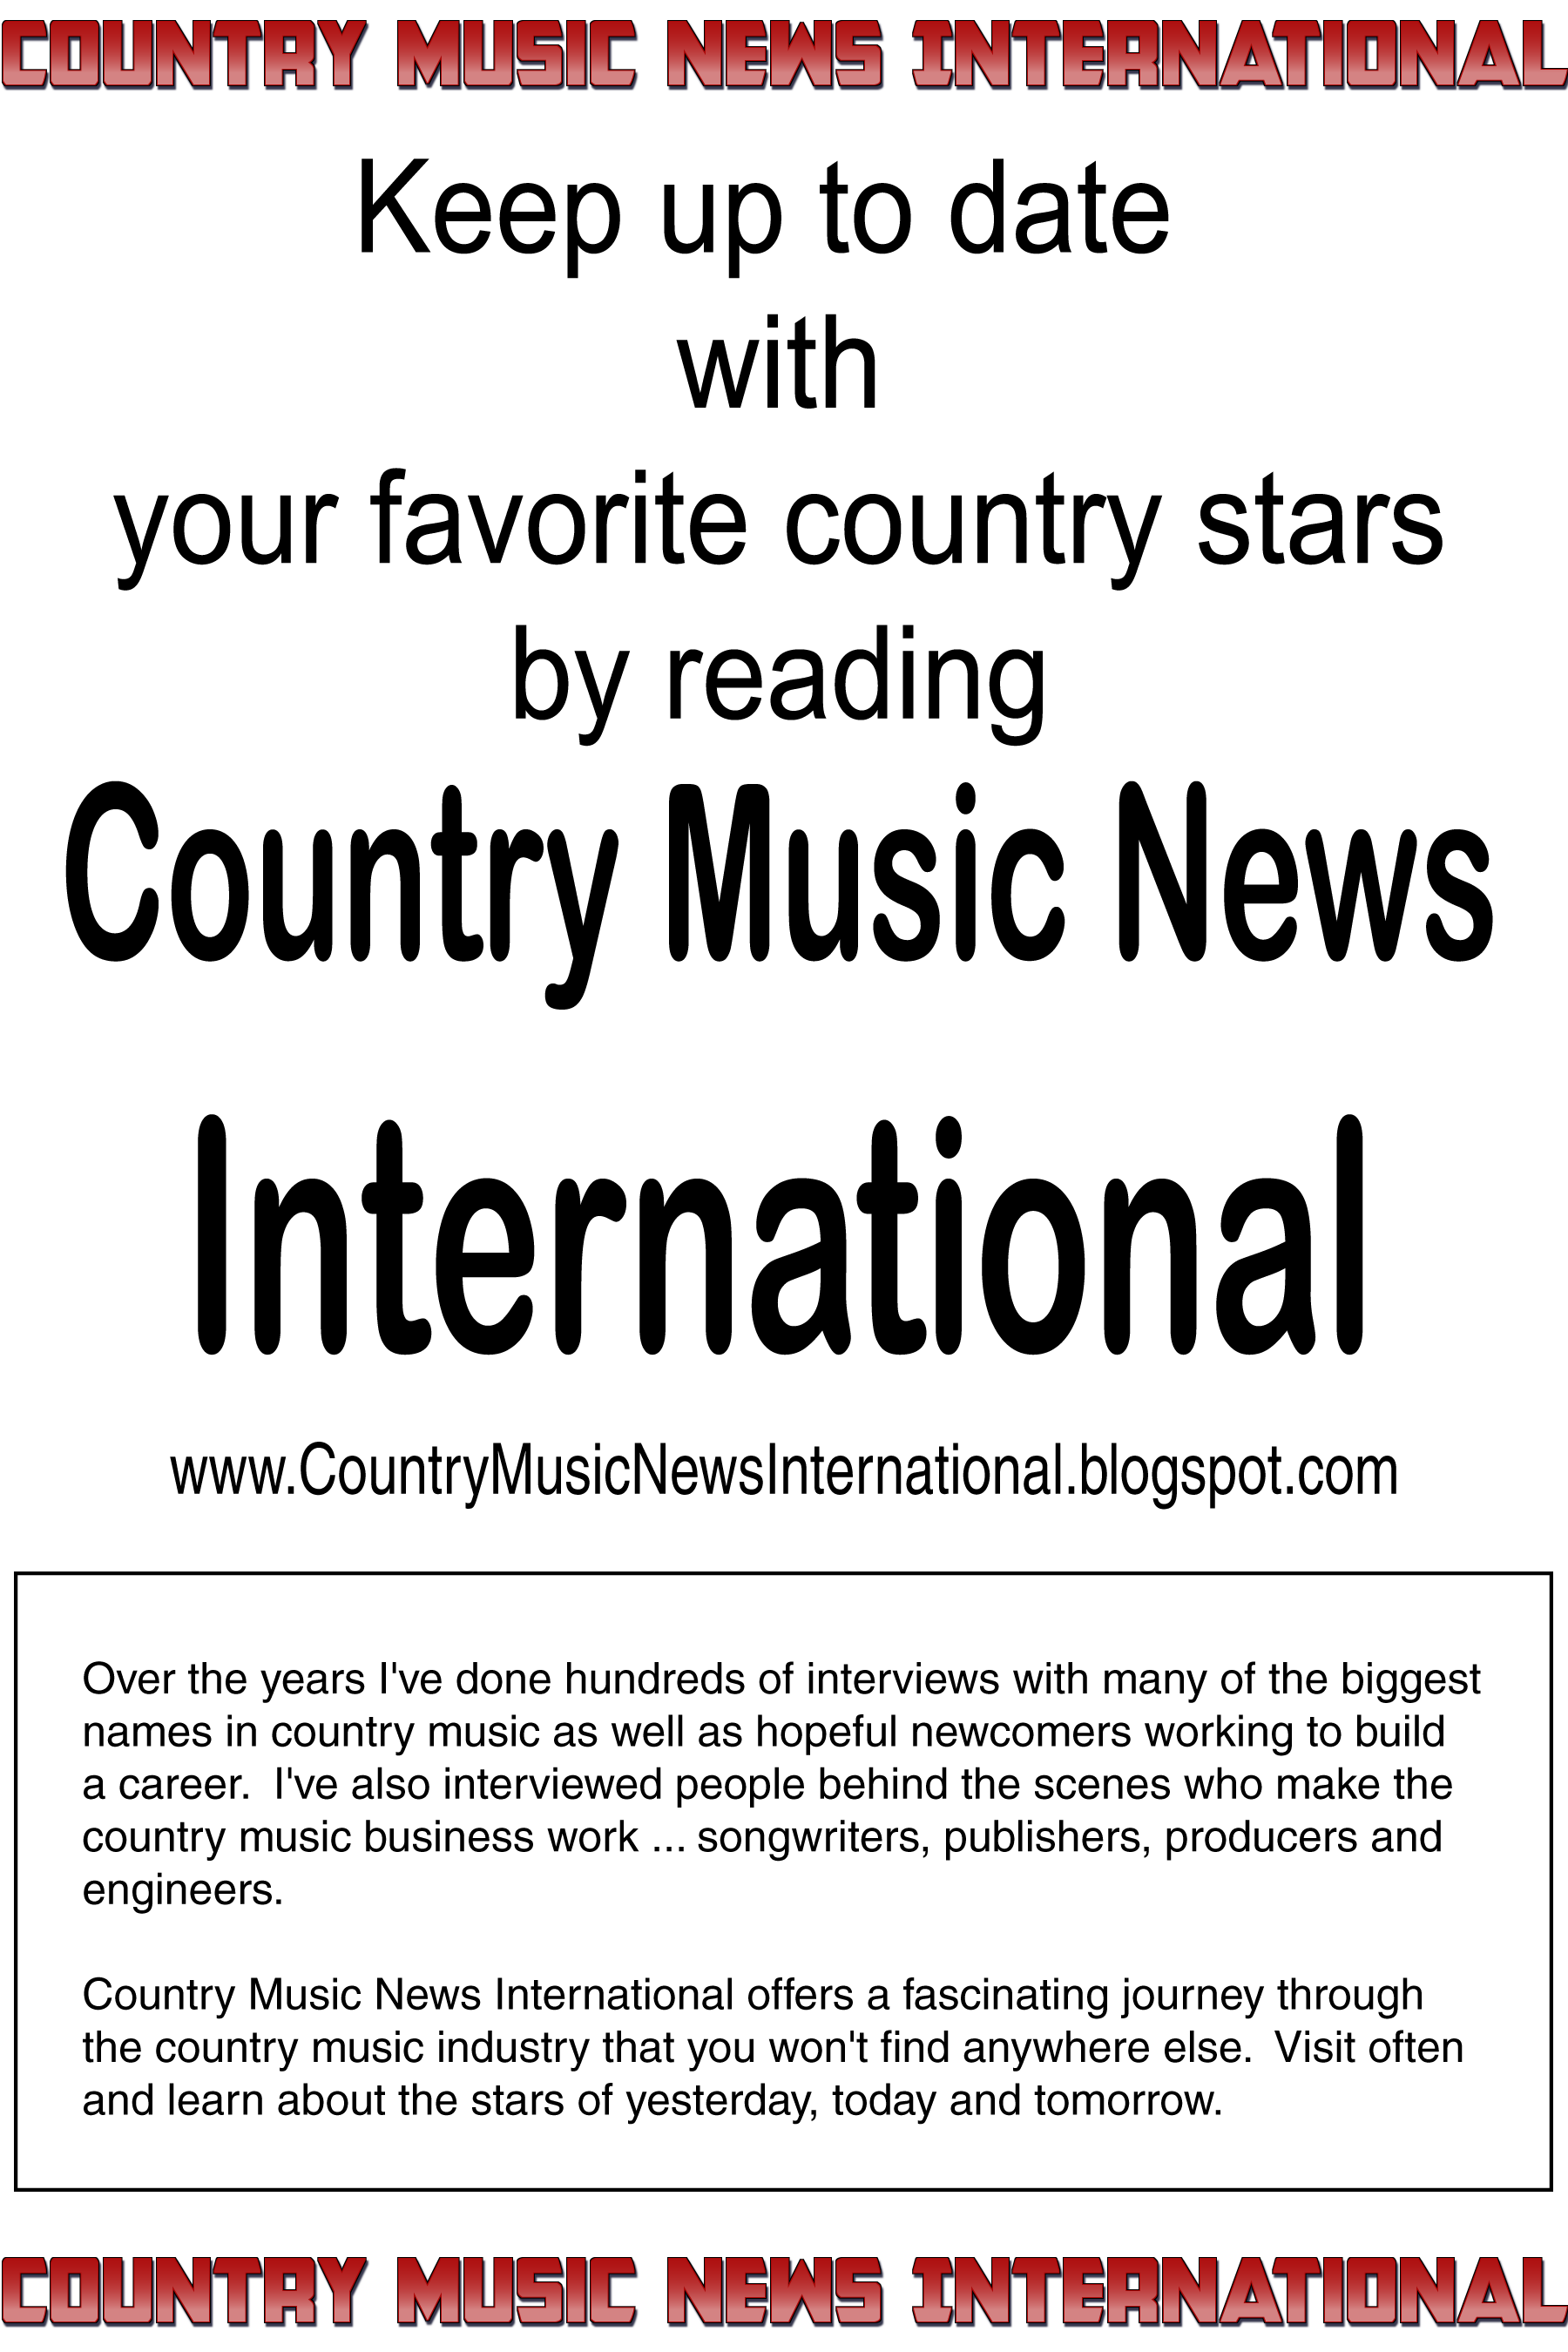 Country Music News International Magazine & Radio Show is supporting Nashville